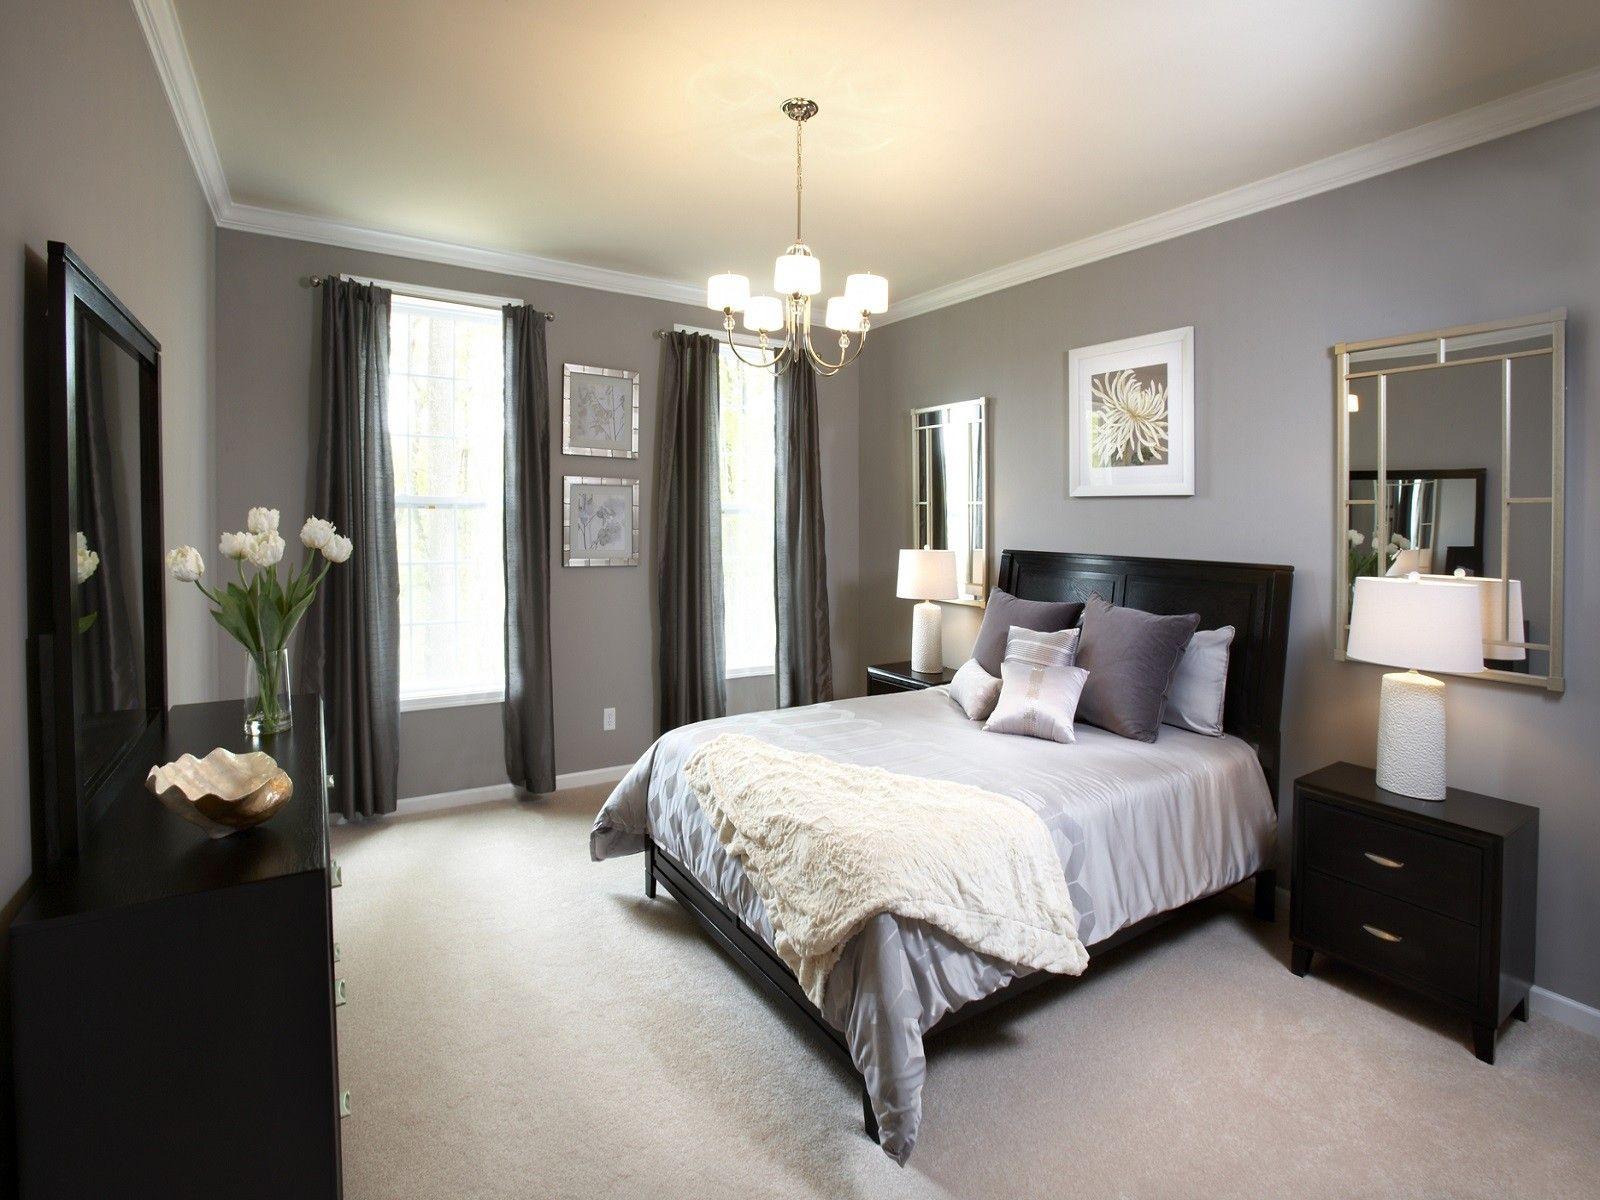 Black Bedroom Inspiration For Master Bedroom Designs Black Gray Bedroom Google Search